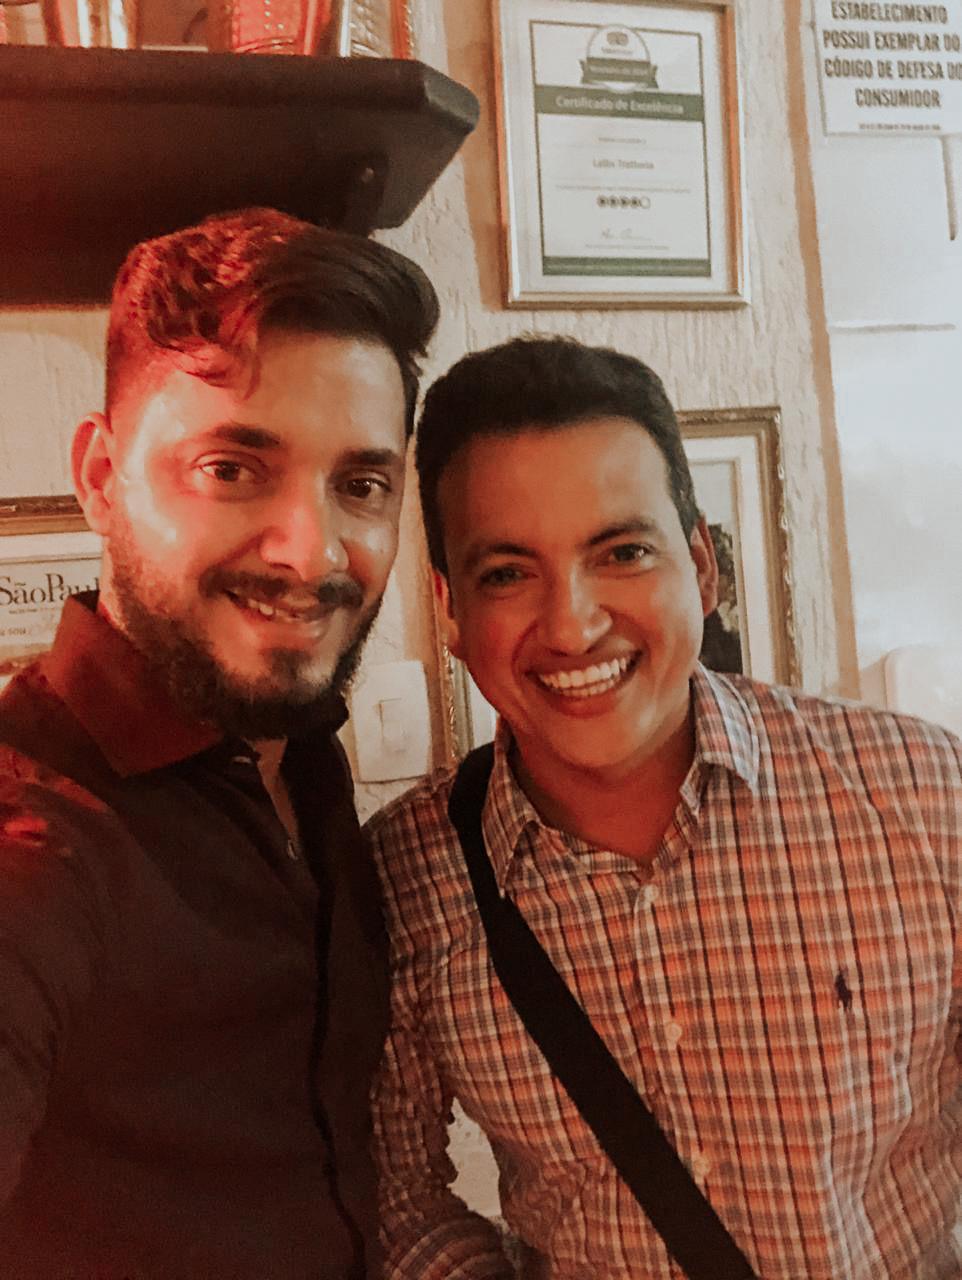 O hair stylist brasiliense Rafael Ribeiro entra para o time de artistas criativos da Olenka Cosméticos